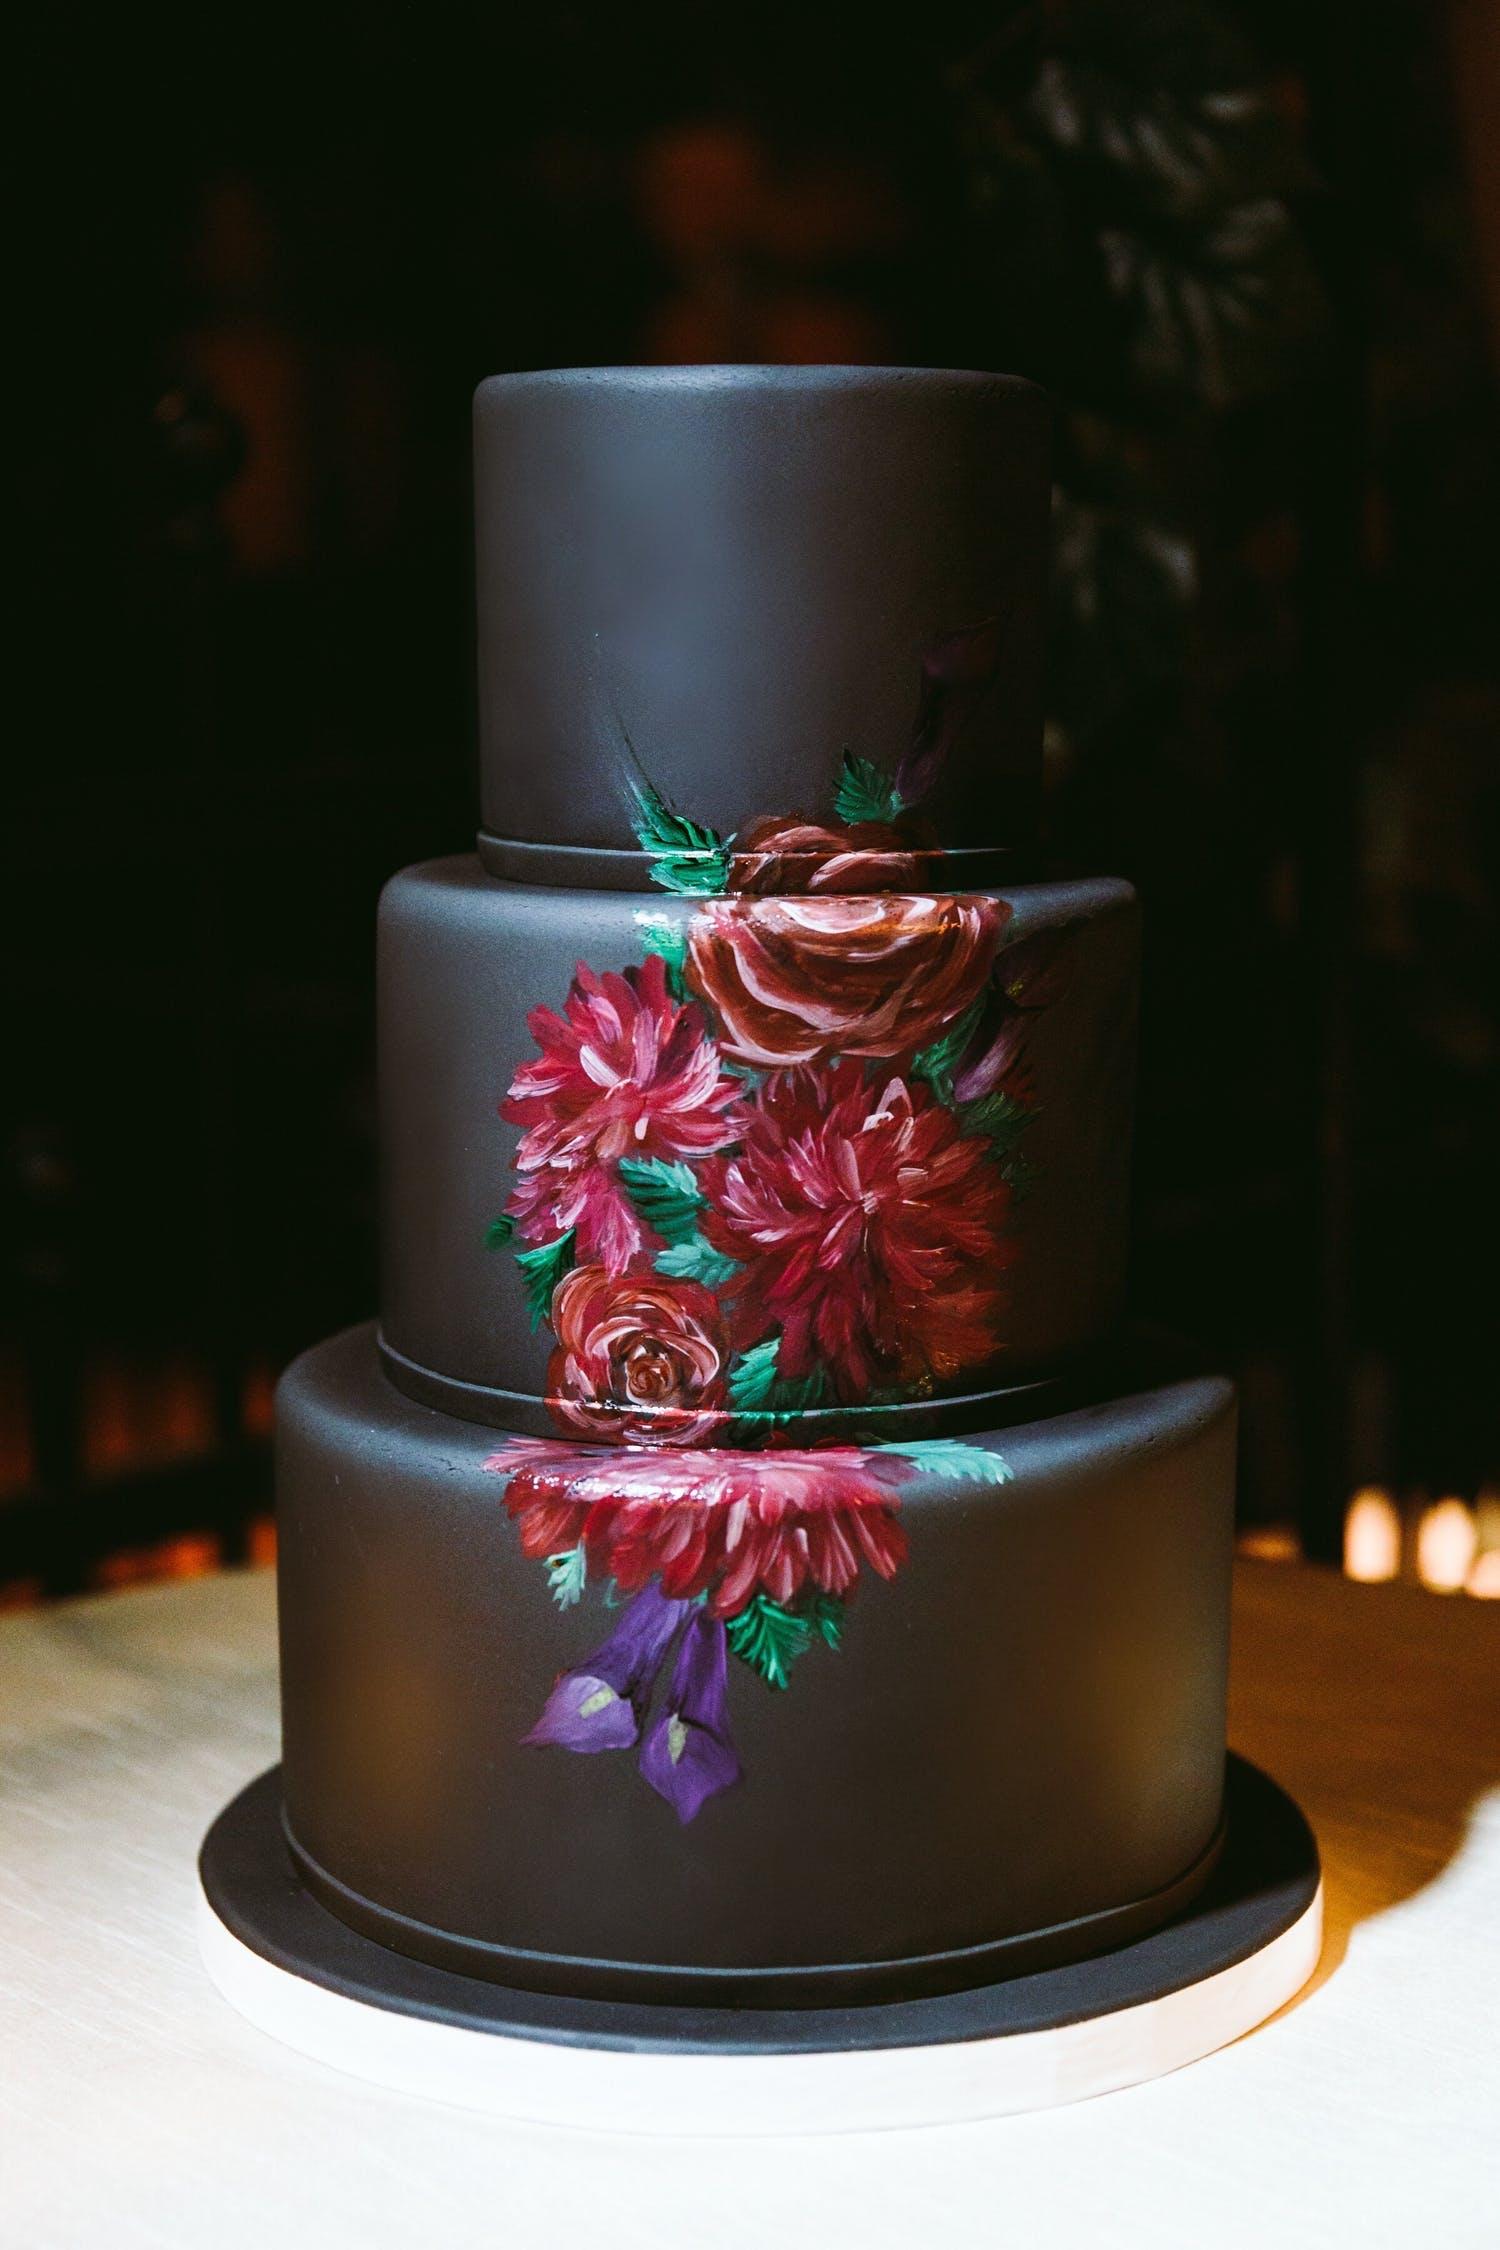 Three-tier black wedding cake with elegant rose design spanning across each tier | PartySlate